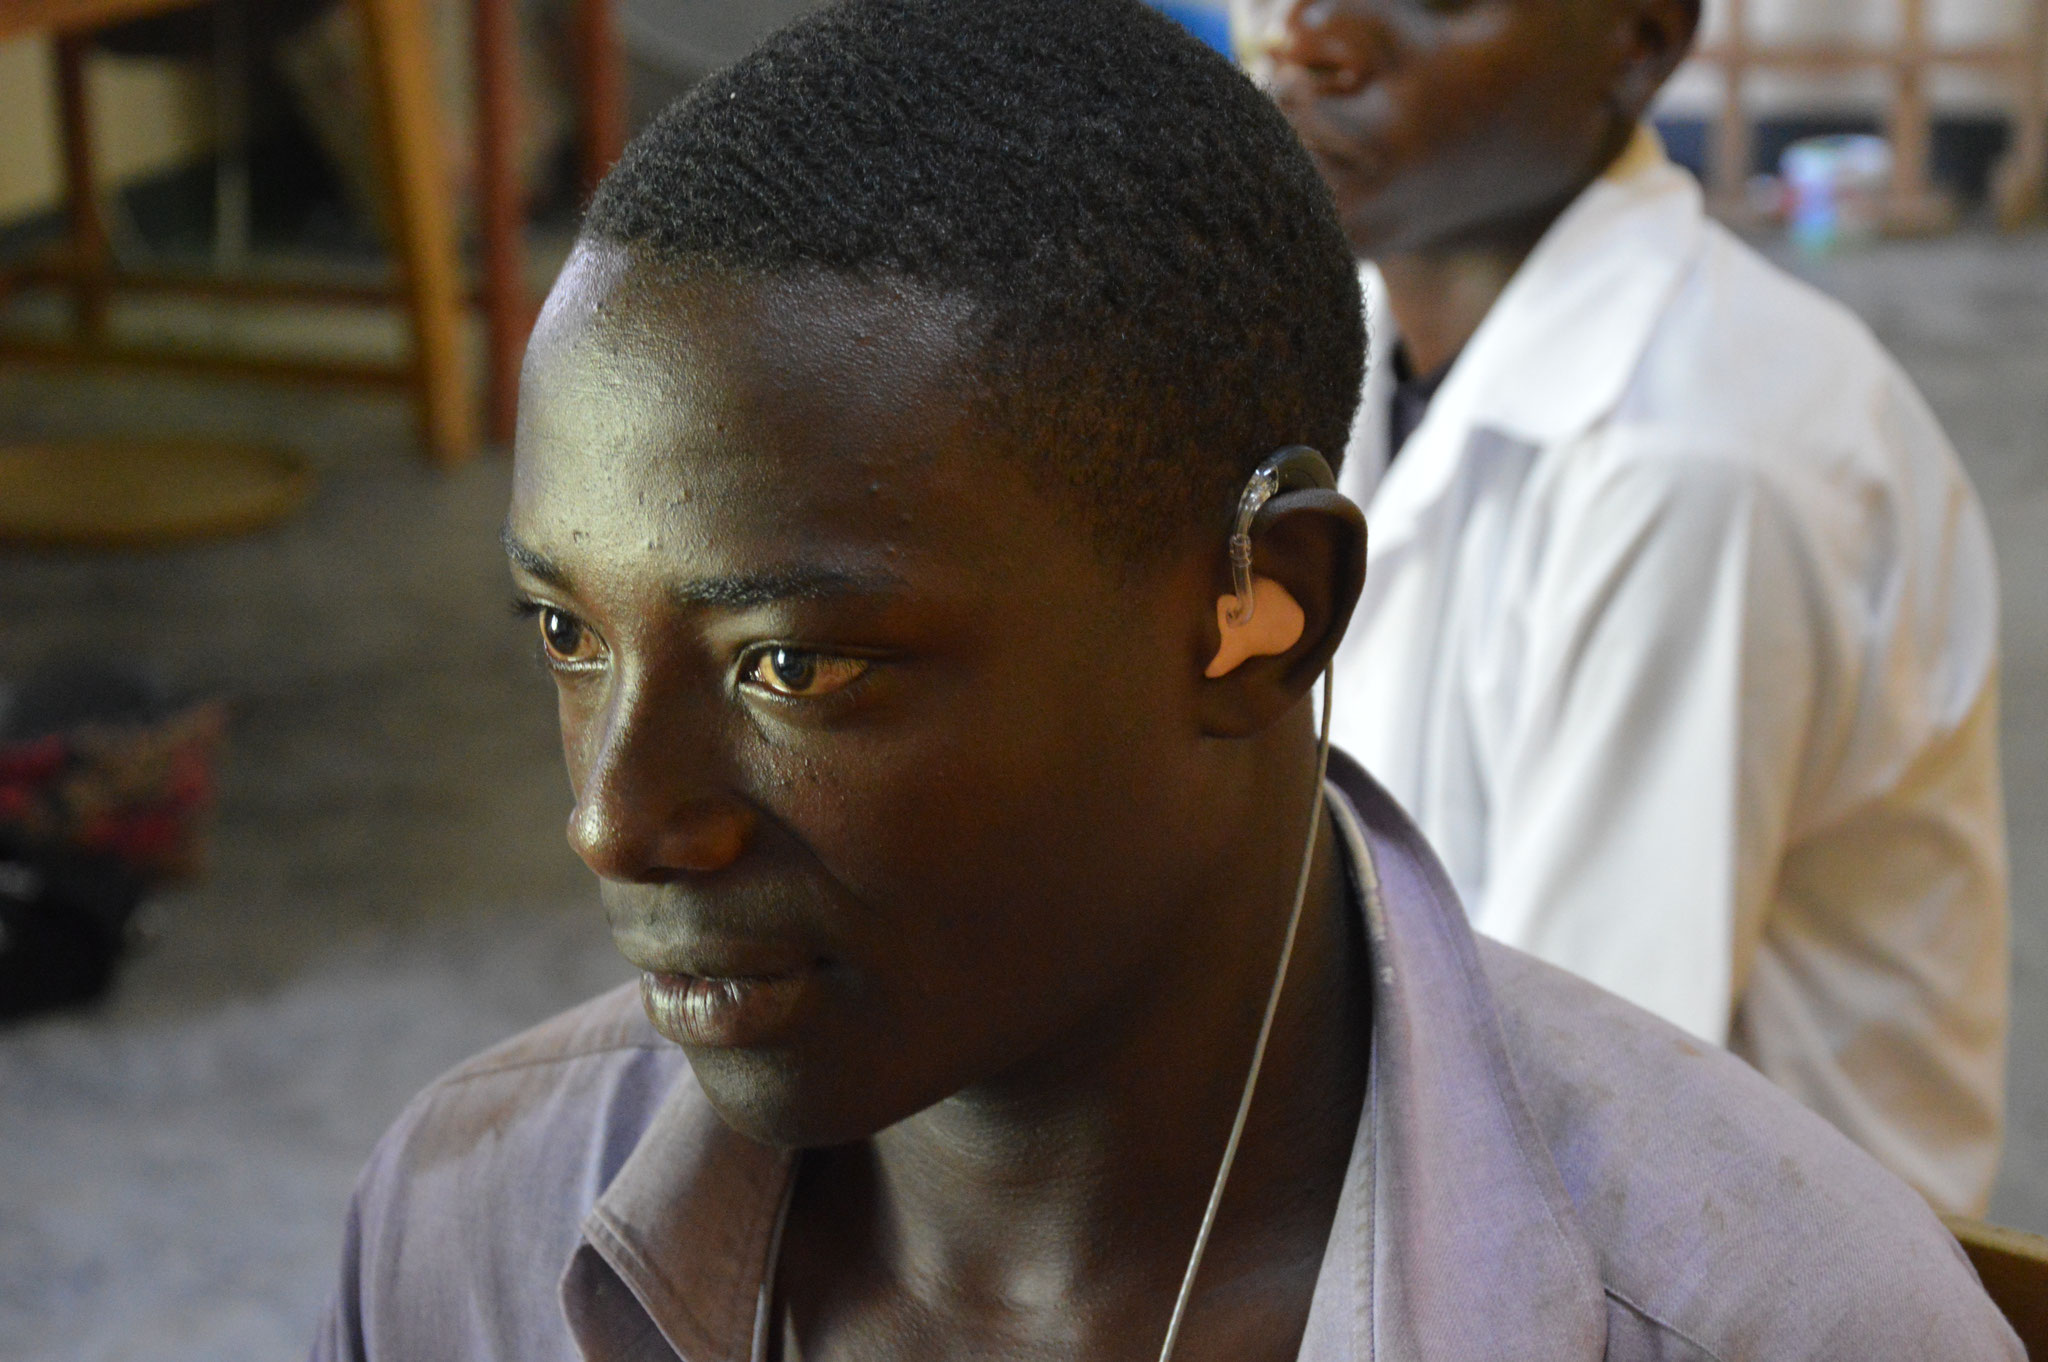 Anpassung der Hörgeräte